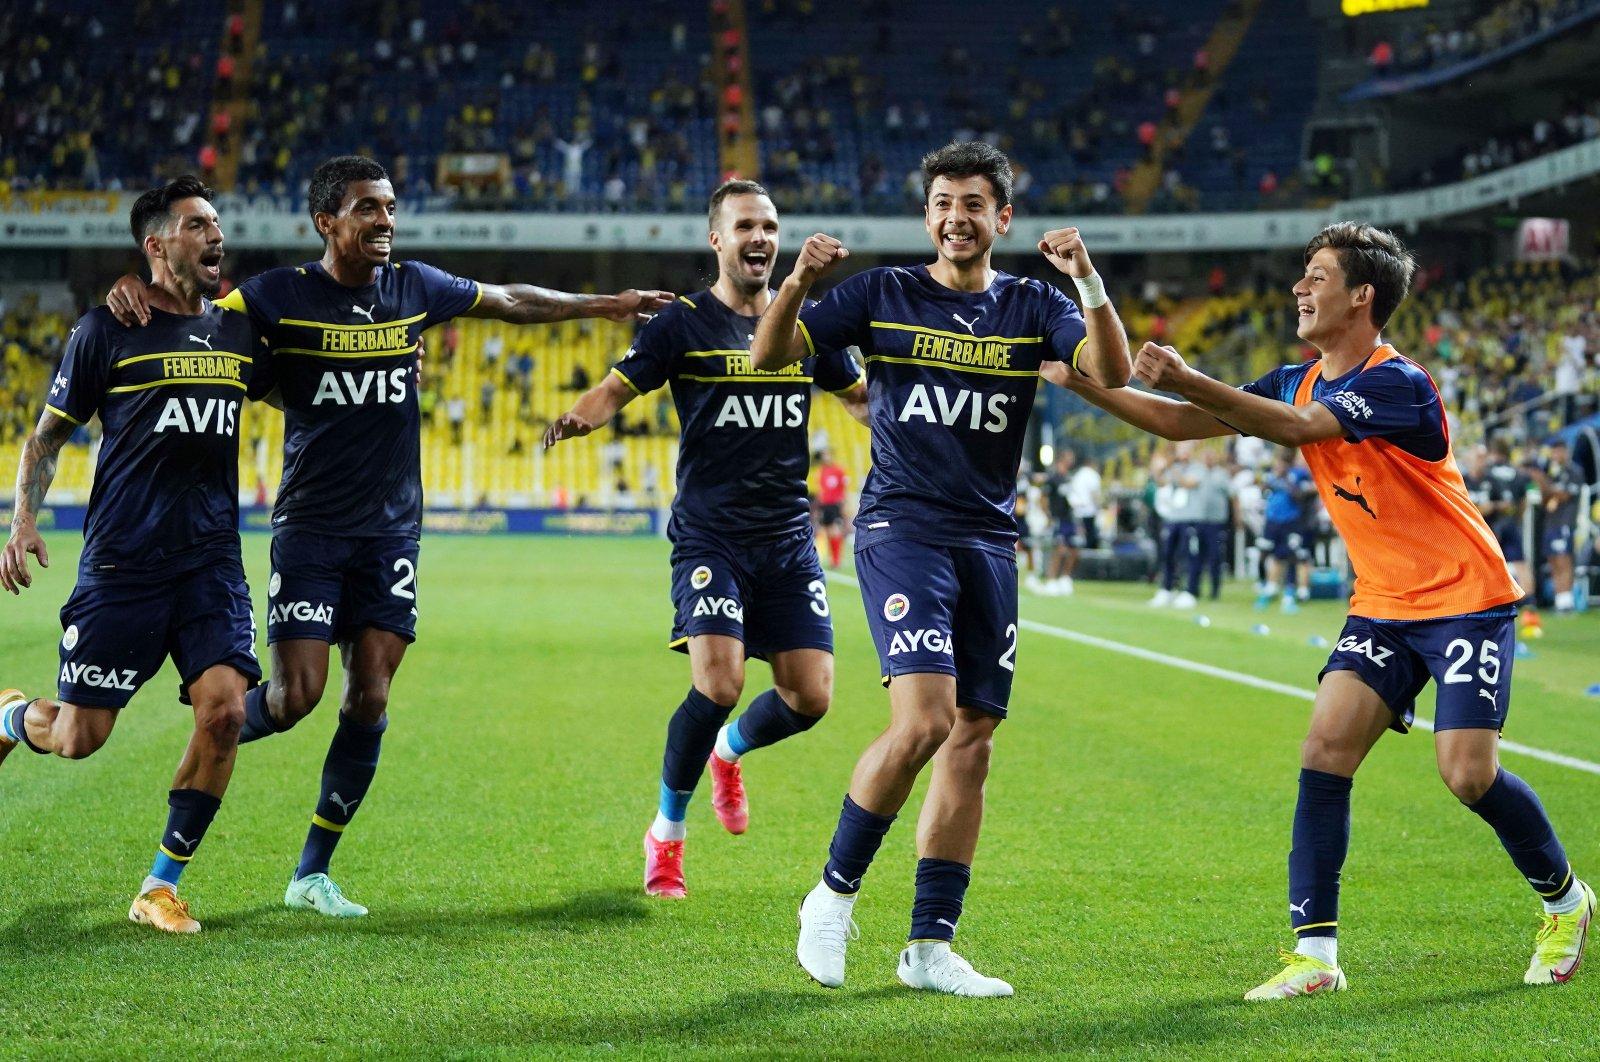 Fenerbahçe's Muhammed Gümüşkaya and his teammates celebrate after the young star's goal during the UEFA Europa League playoff first league match at Şükrü Saraçoğlu Stadium, Istanbul, Turkey, on Aug. 19, 2021. (IHA Photo)